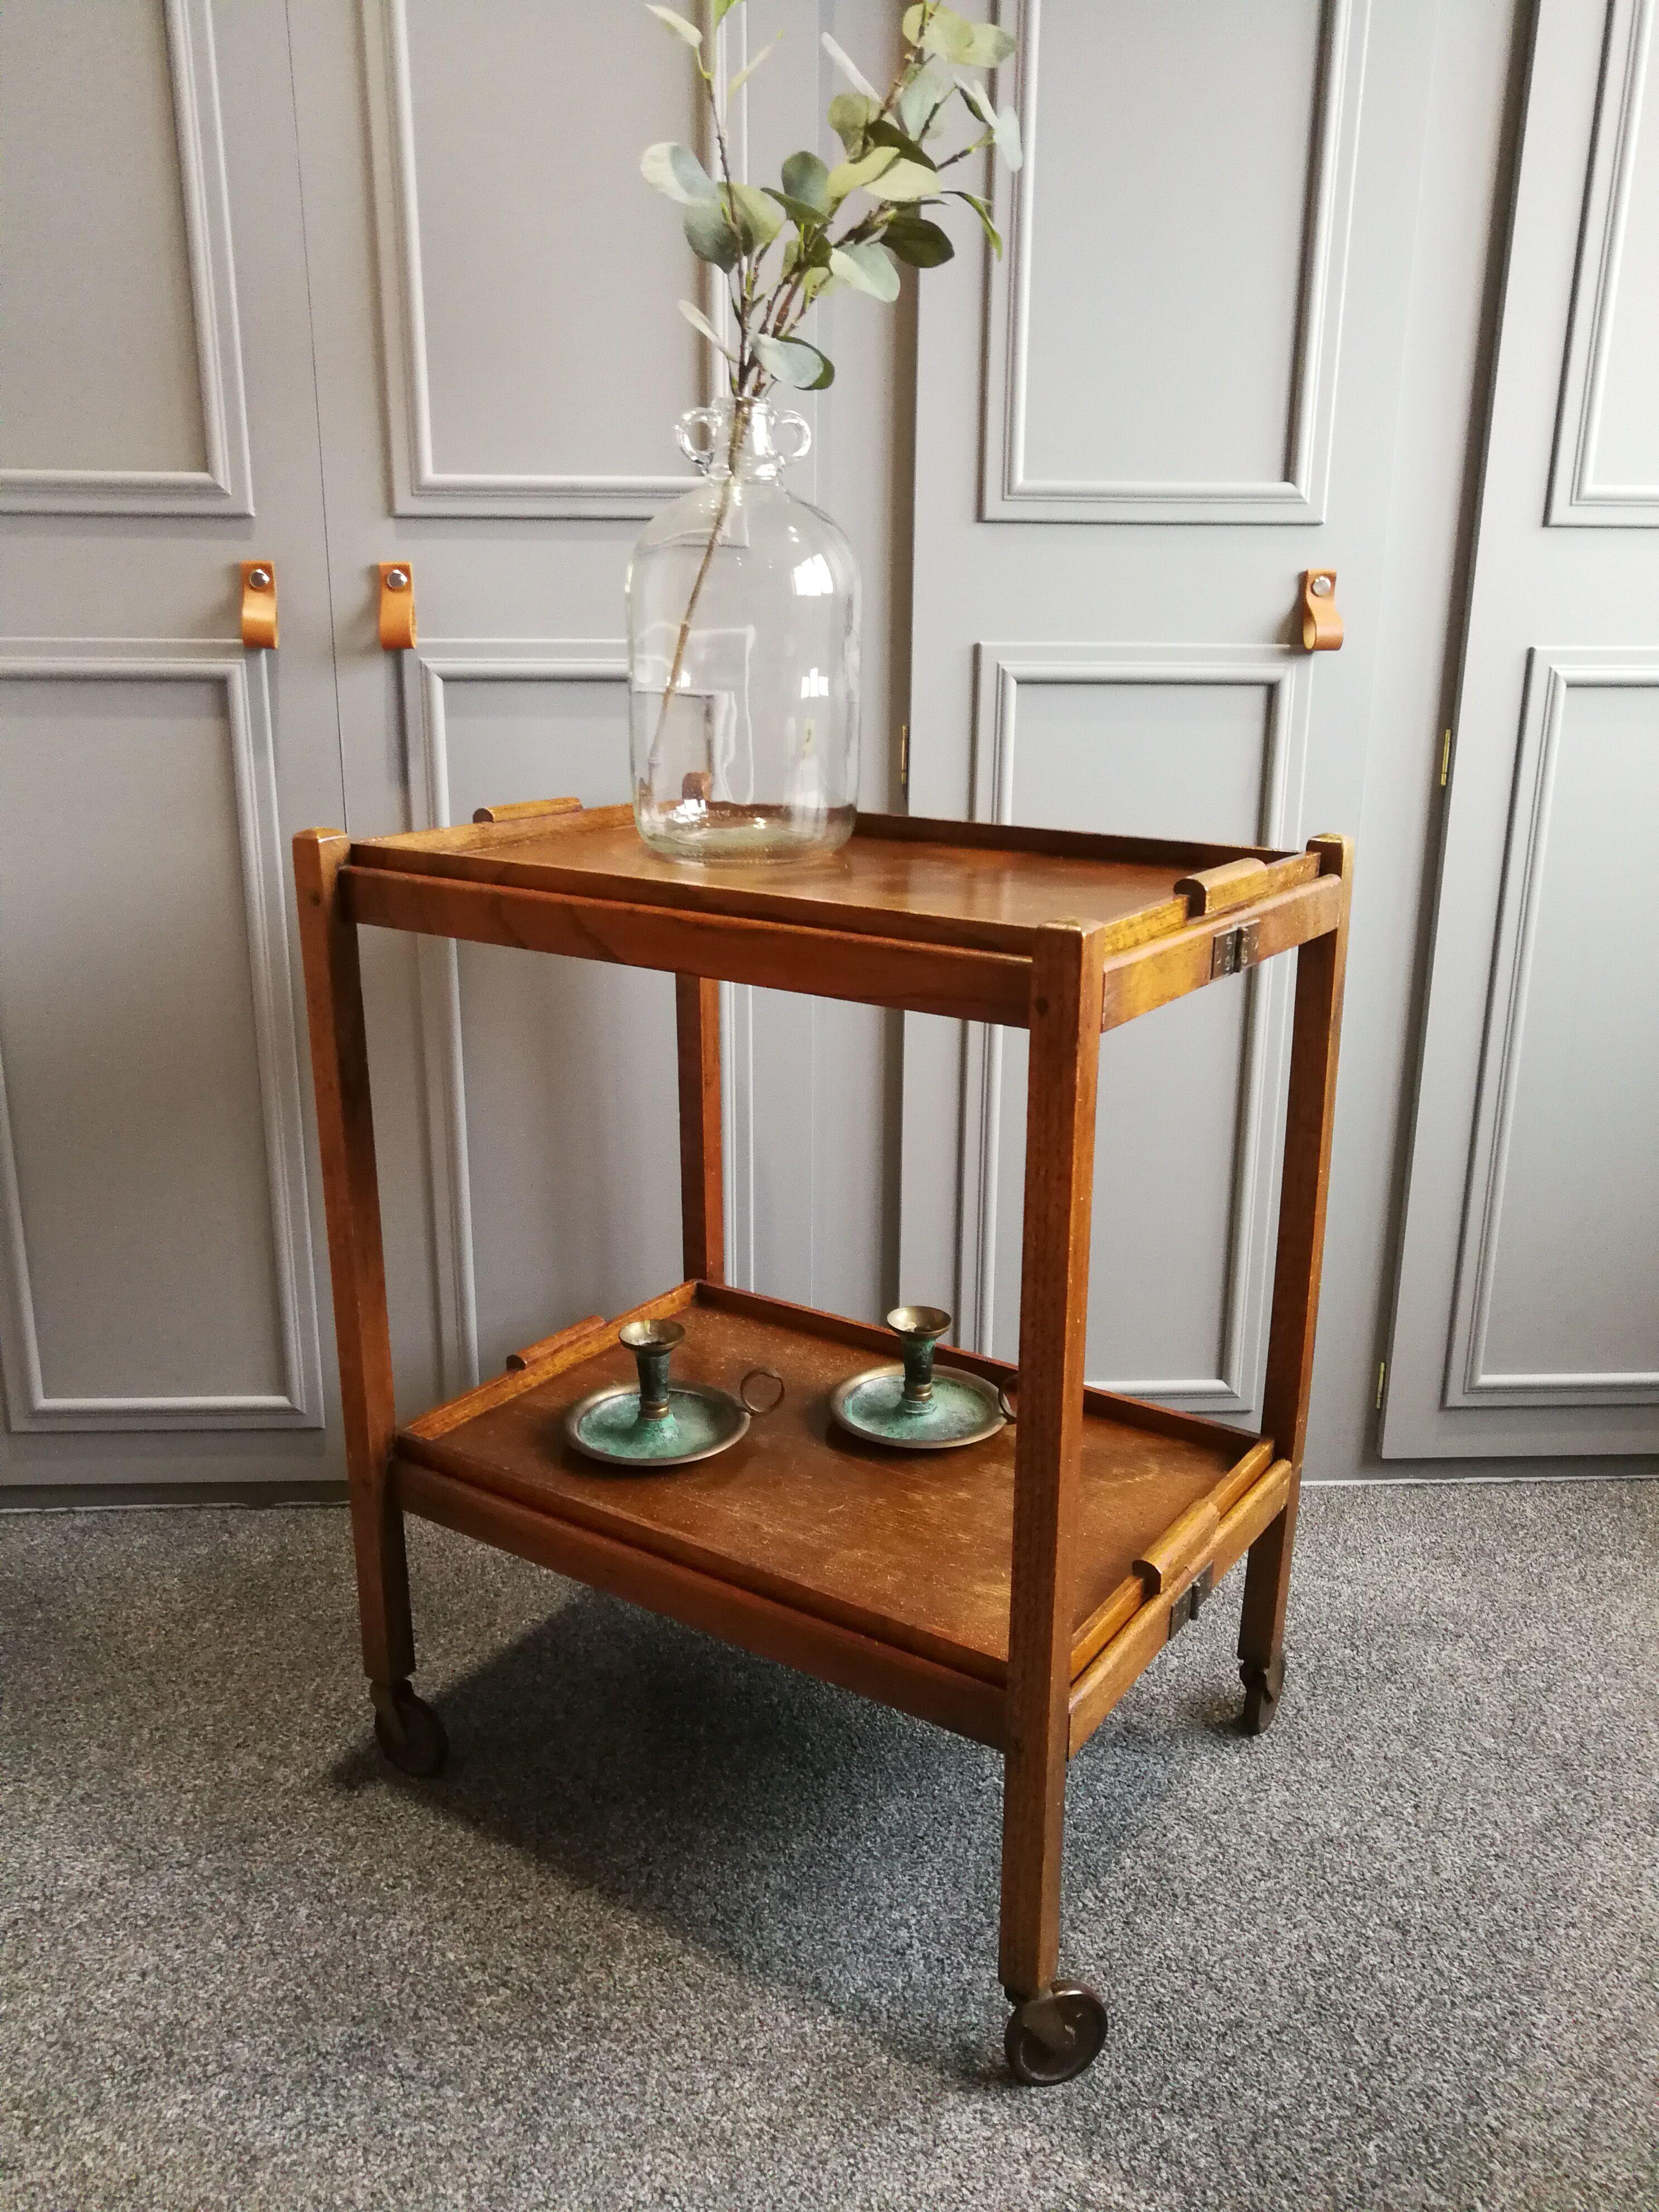 Butler tray plateau table pliante Table pliante bois Desserte d/'Appoint Bois